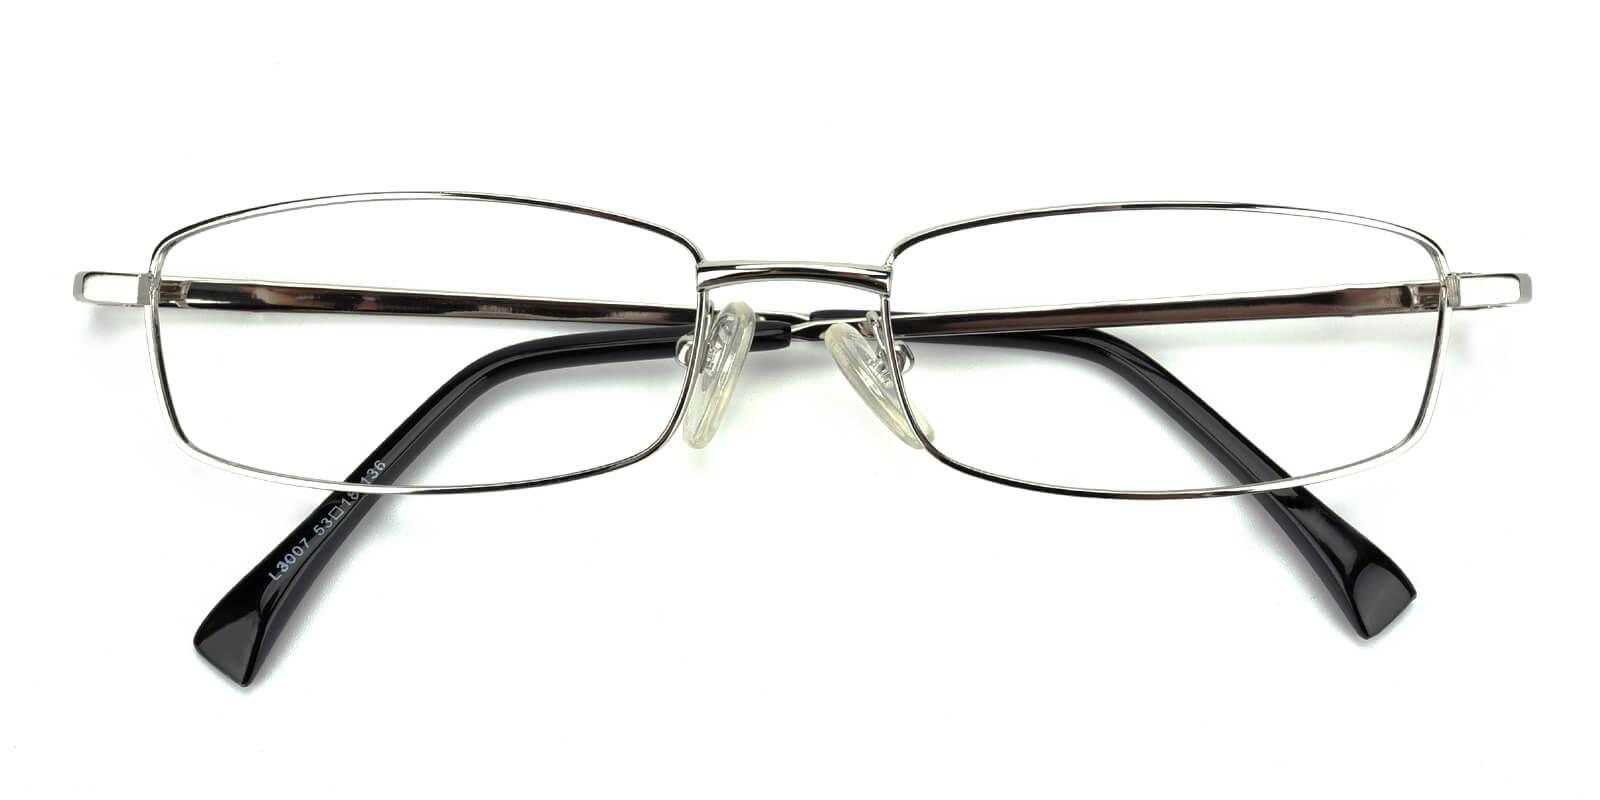 Chistopol-Silver-Rectangle-Metal-Eyeglasses-detail